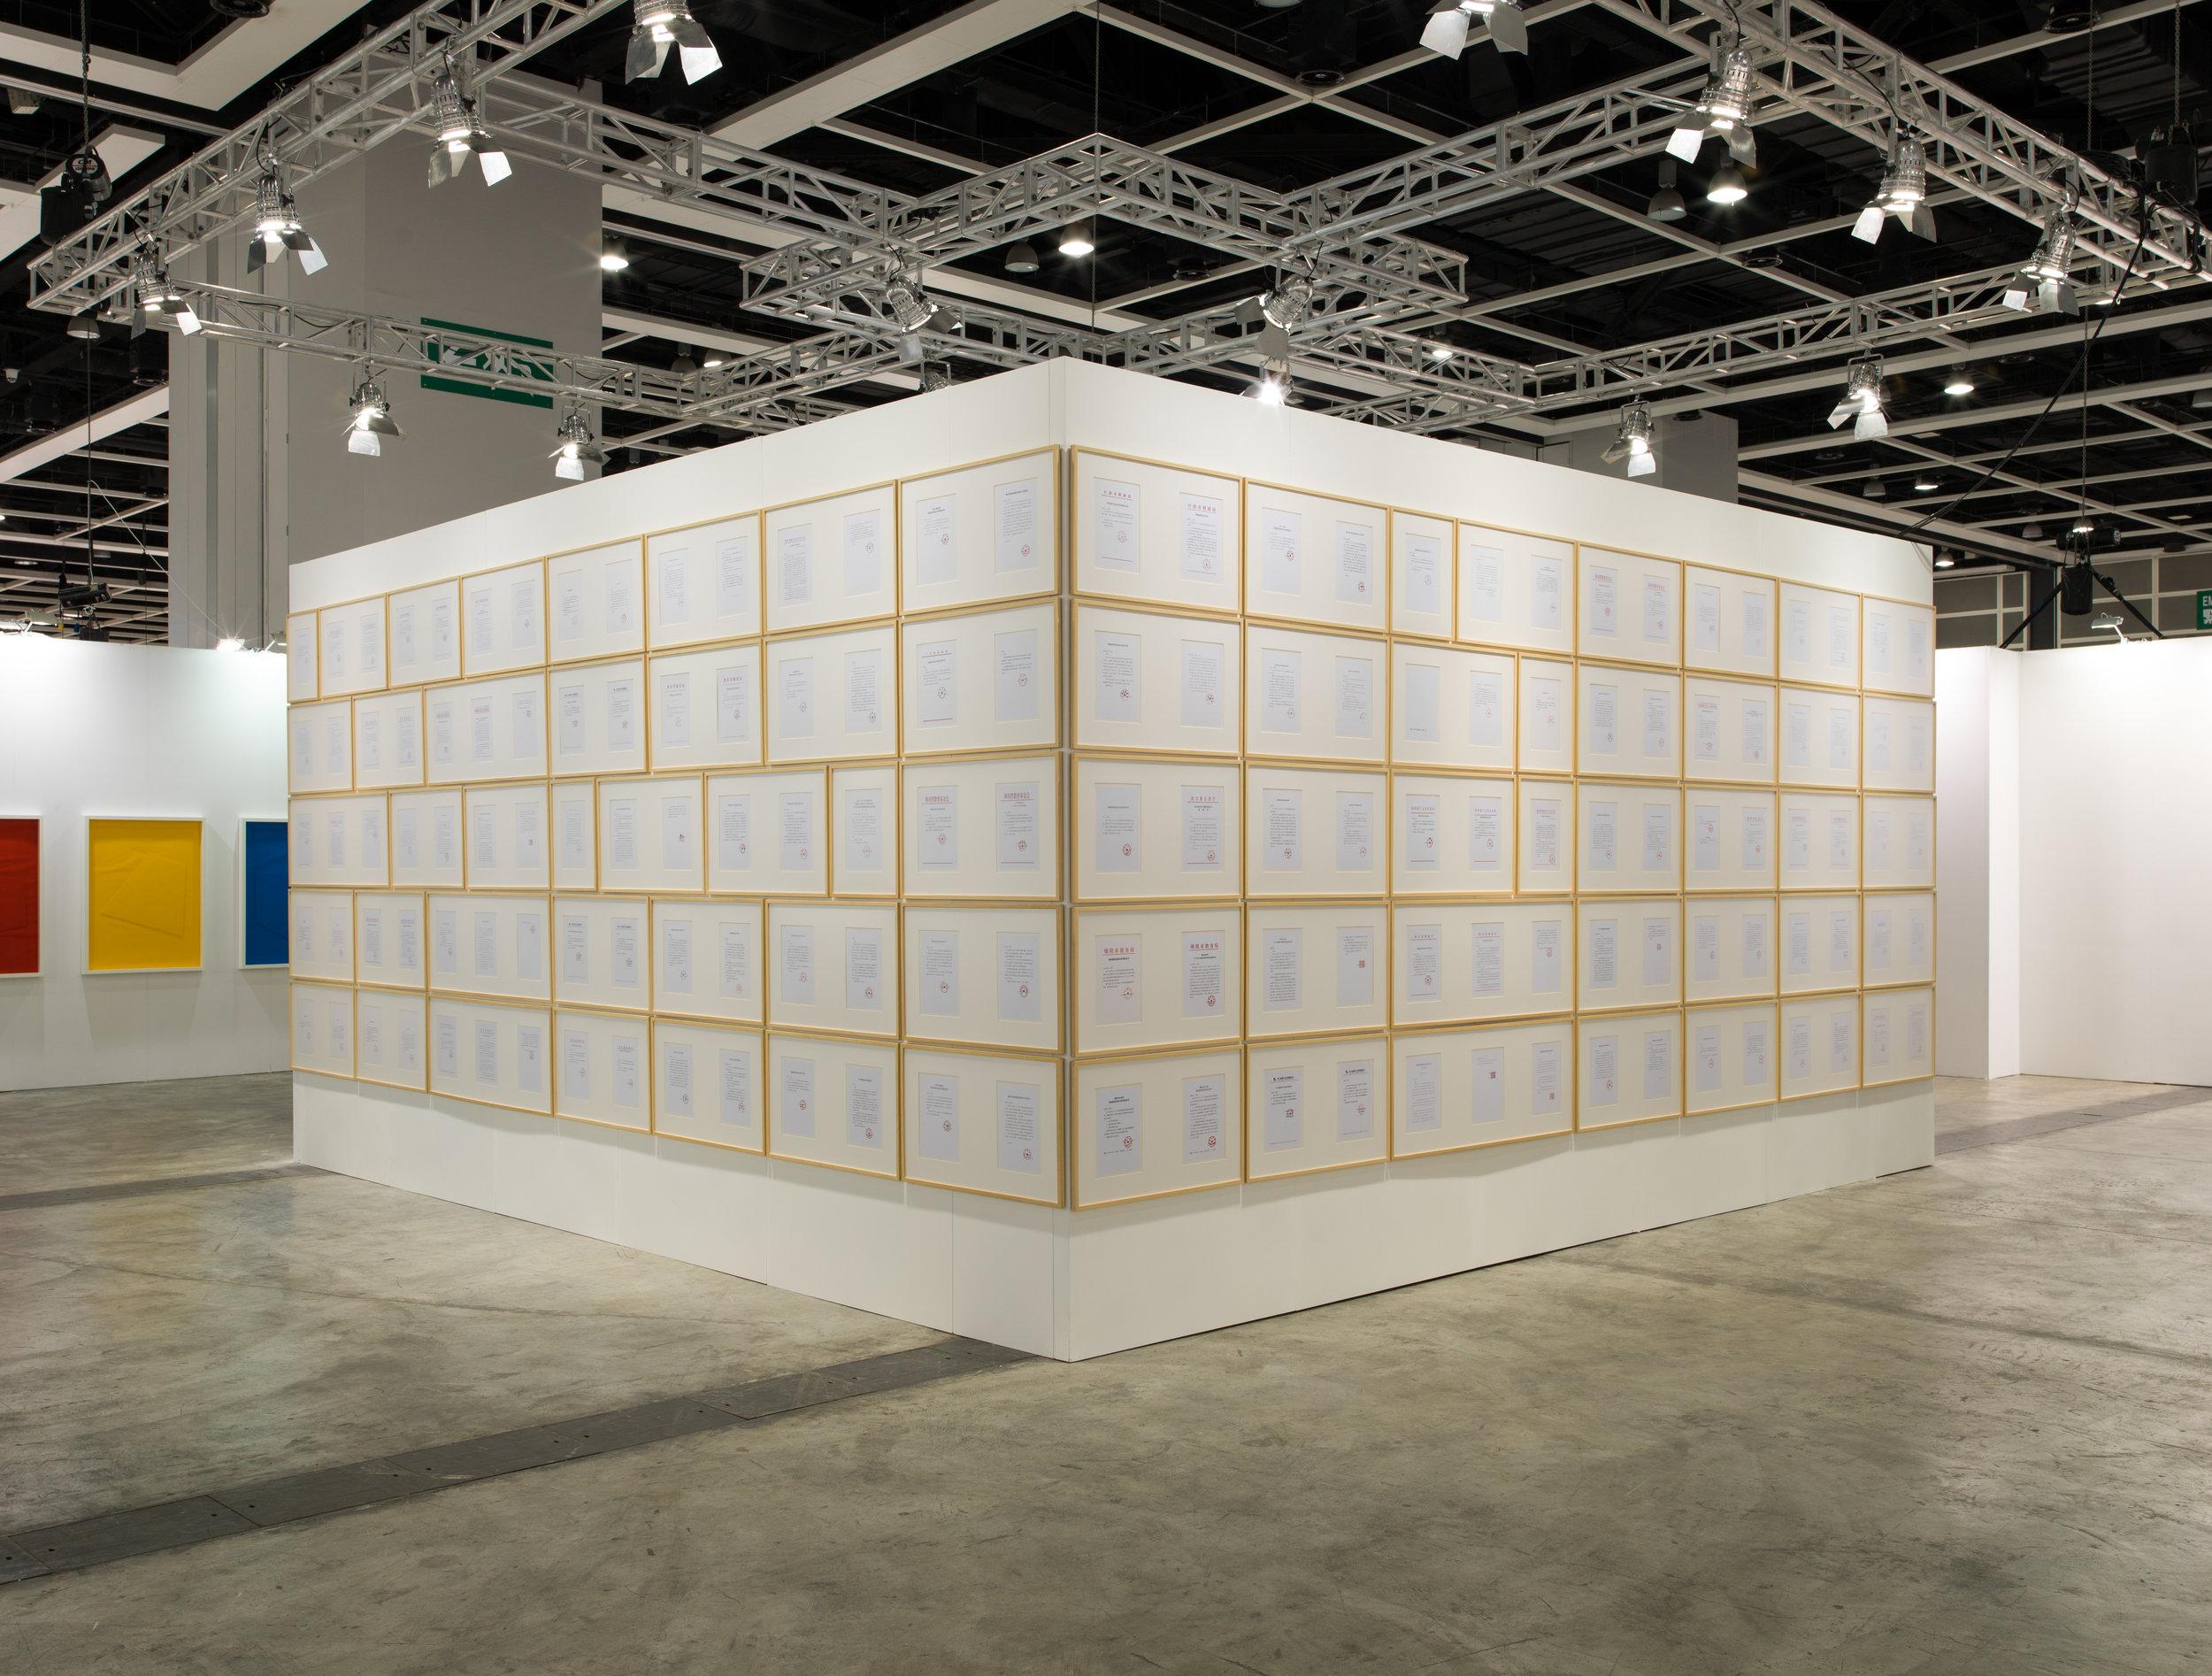 Cong, 2008-2011 (Installation view at the Hong Kong International Art Fair, 2012) - 3.jpg